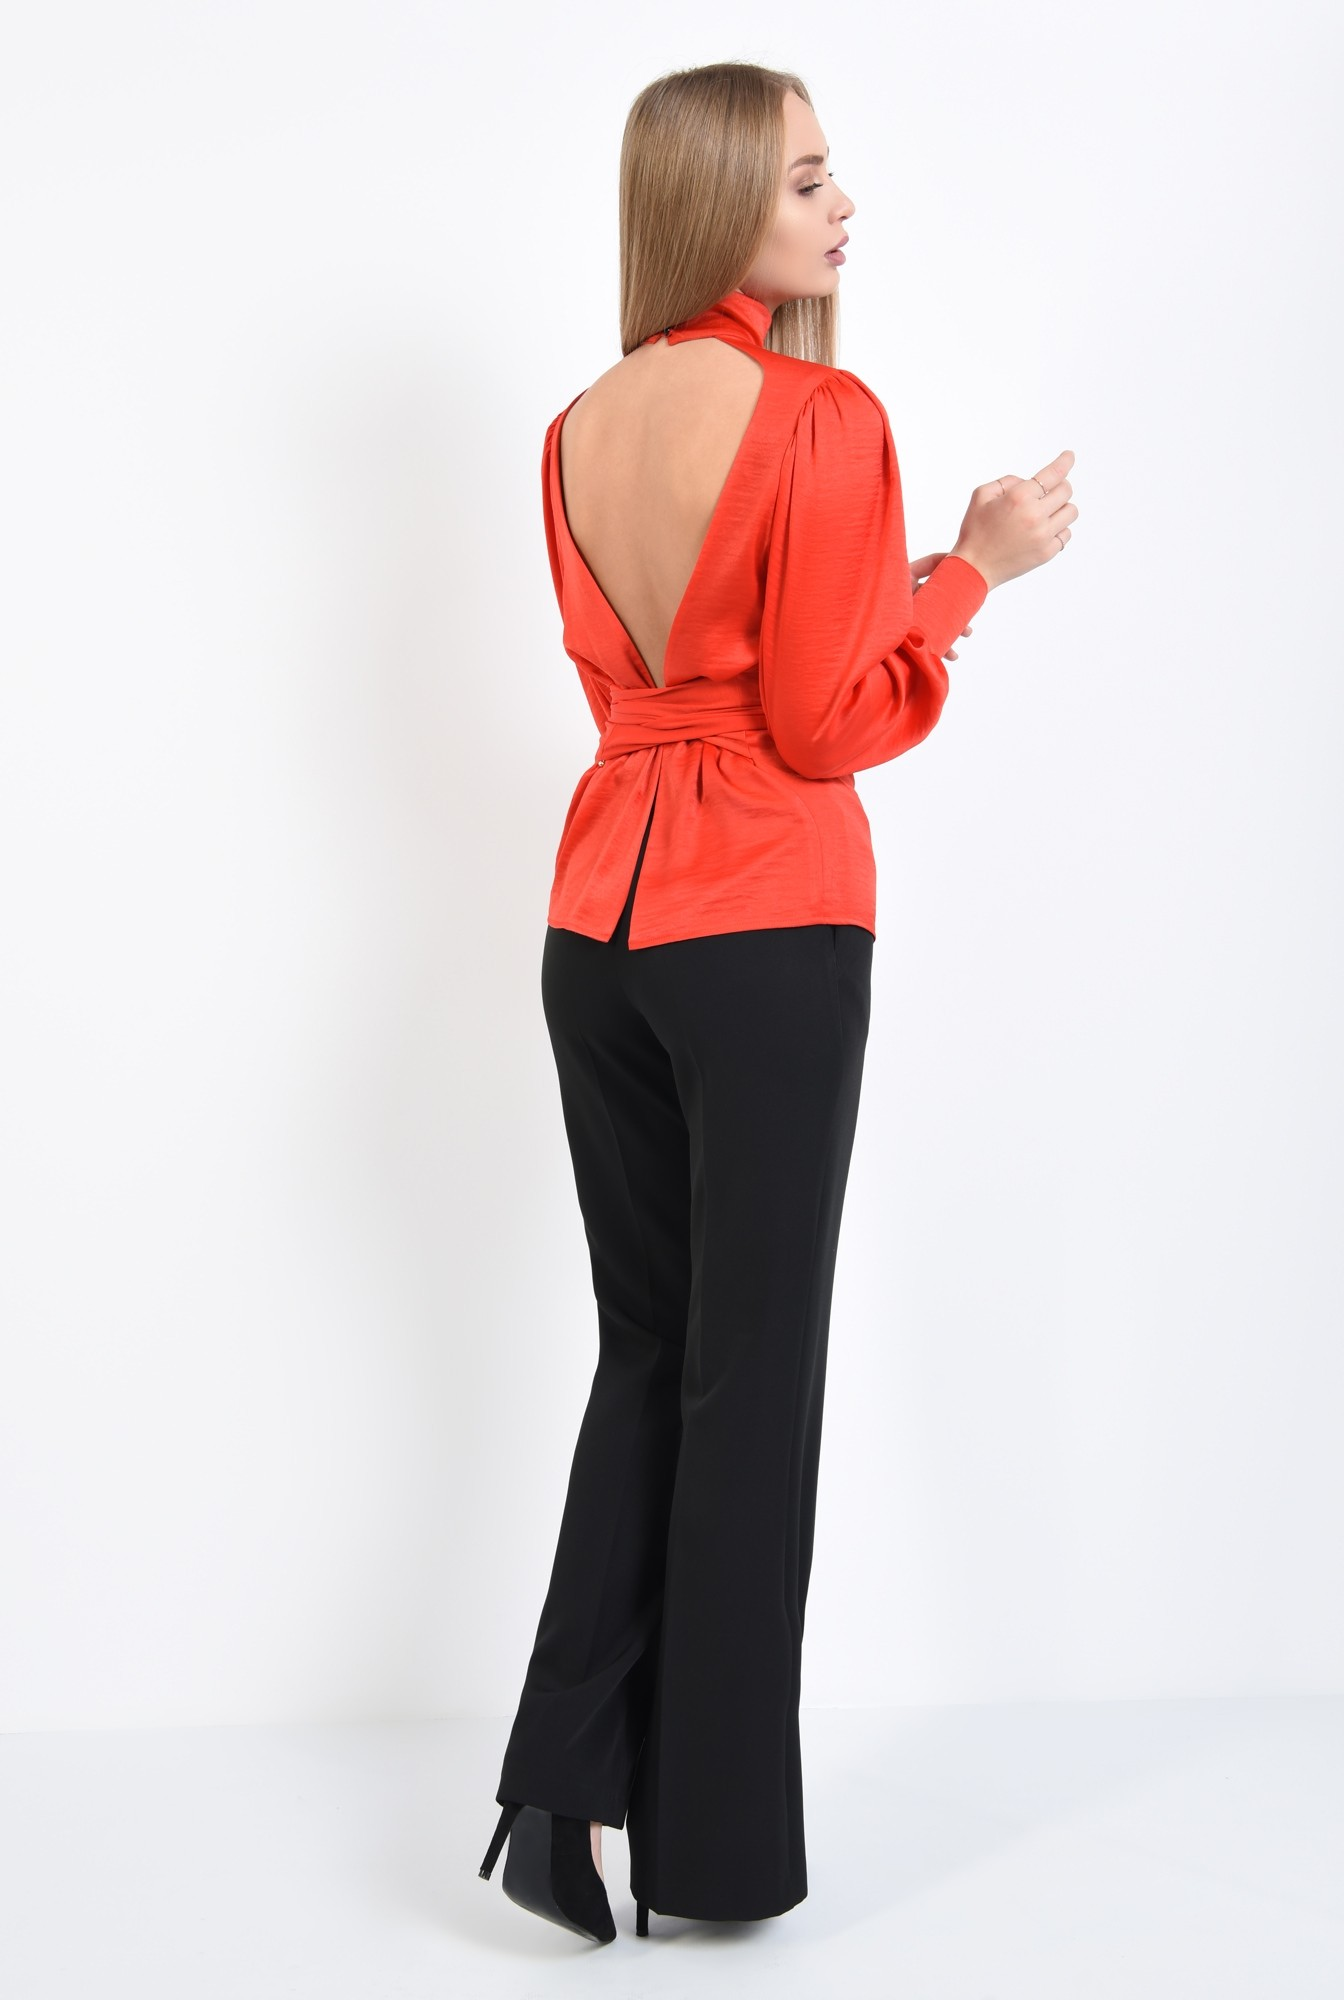 1 - 360 - bluza de ocazie, rosu, cu funda, cu maneci lungi